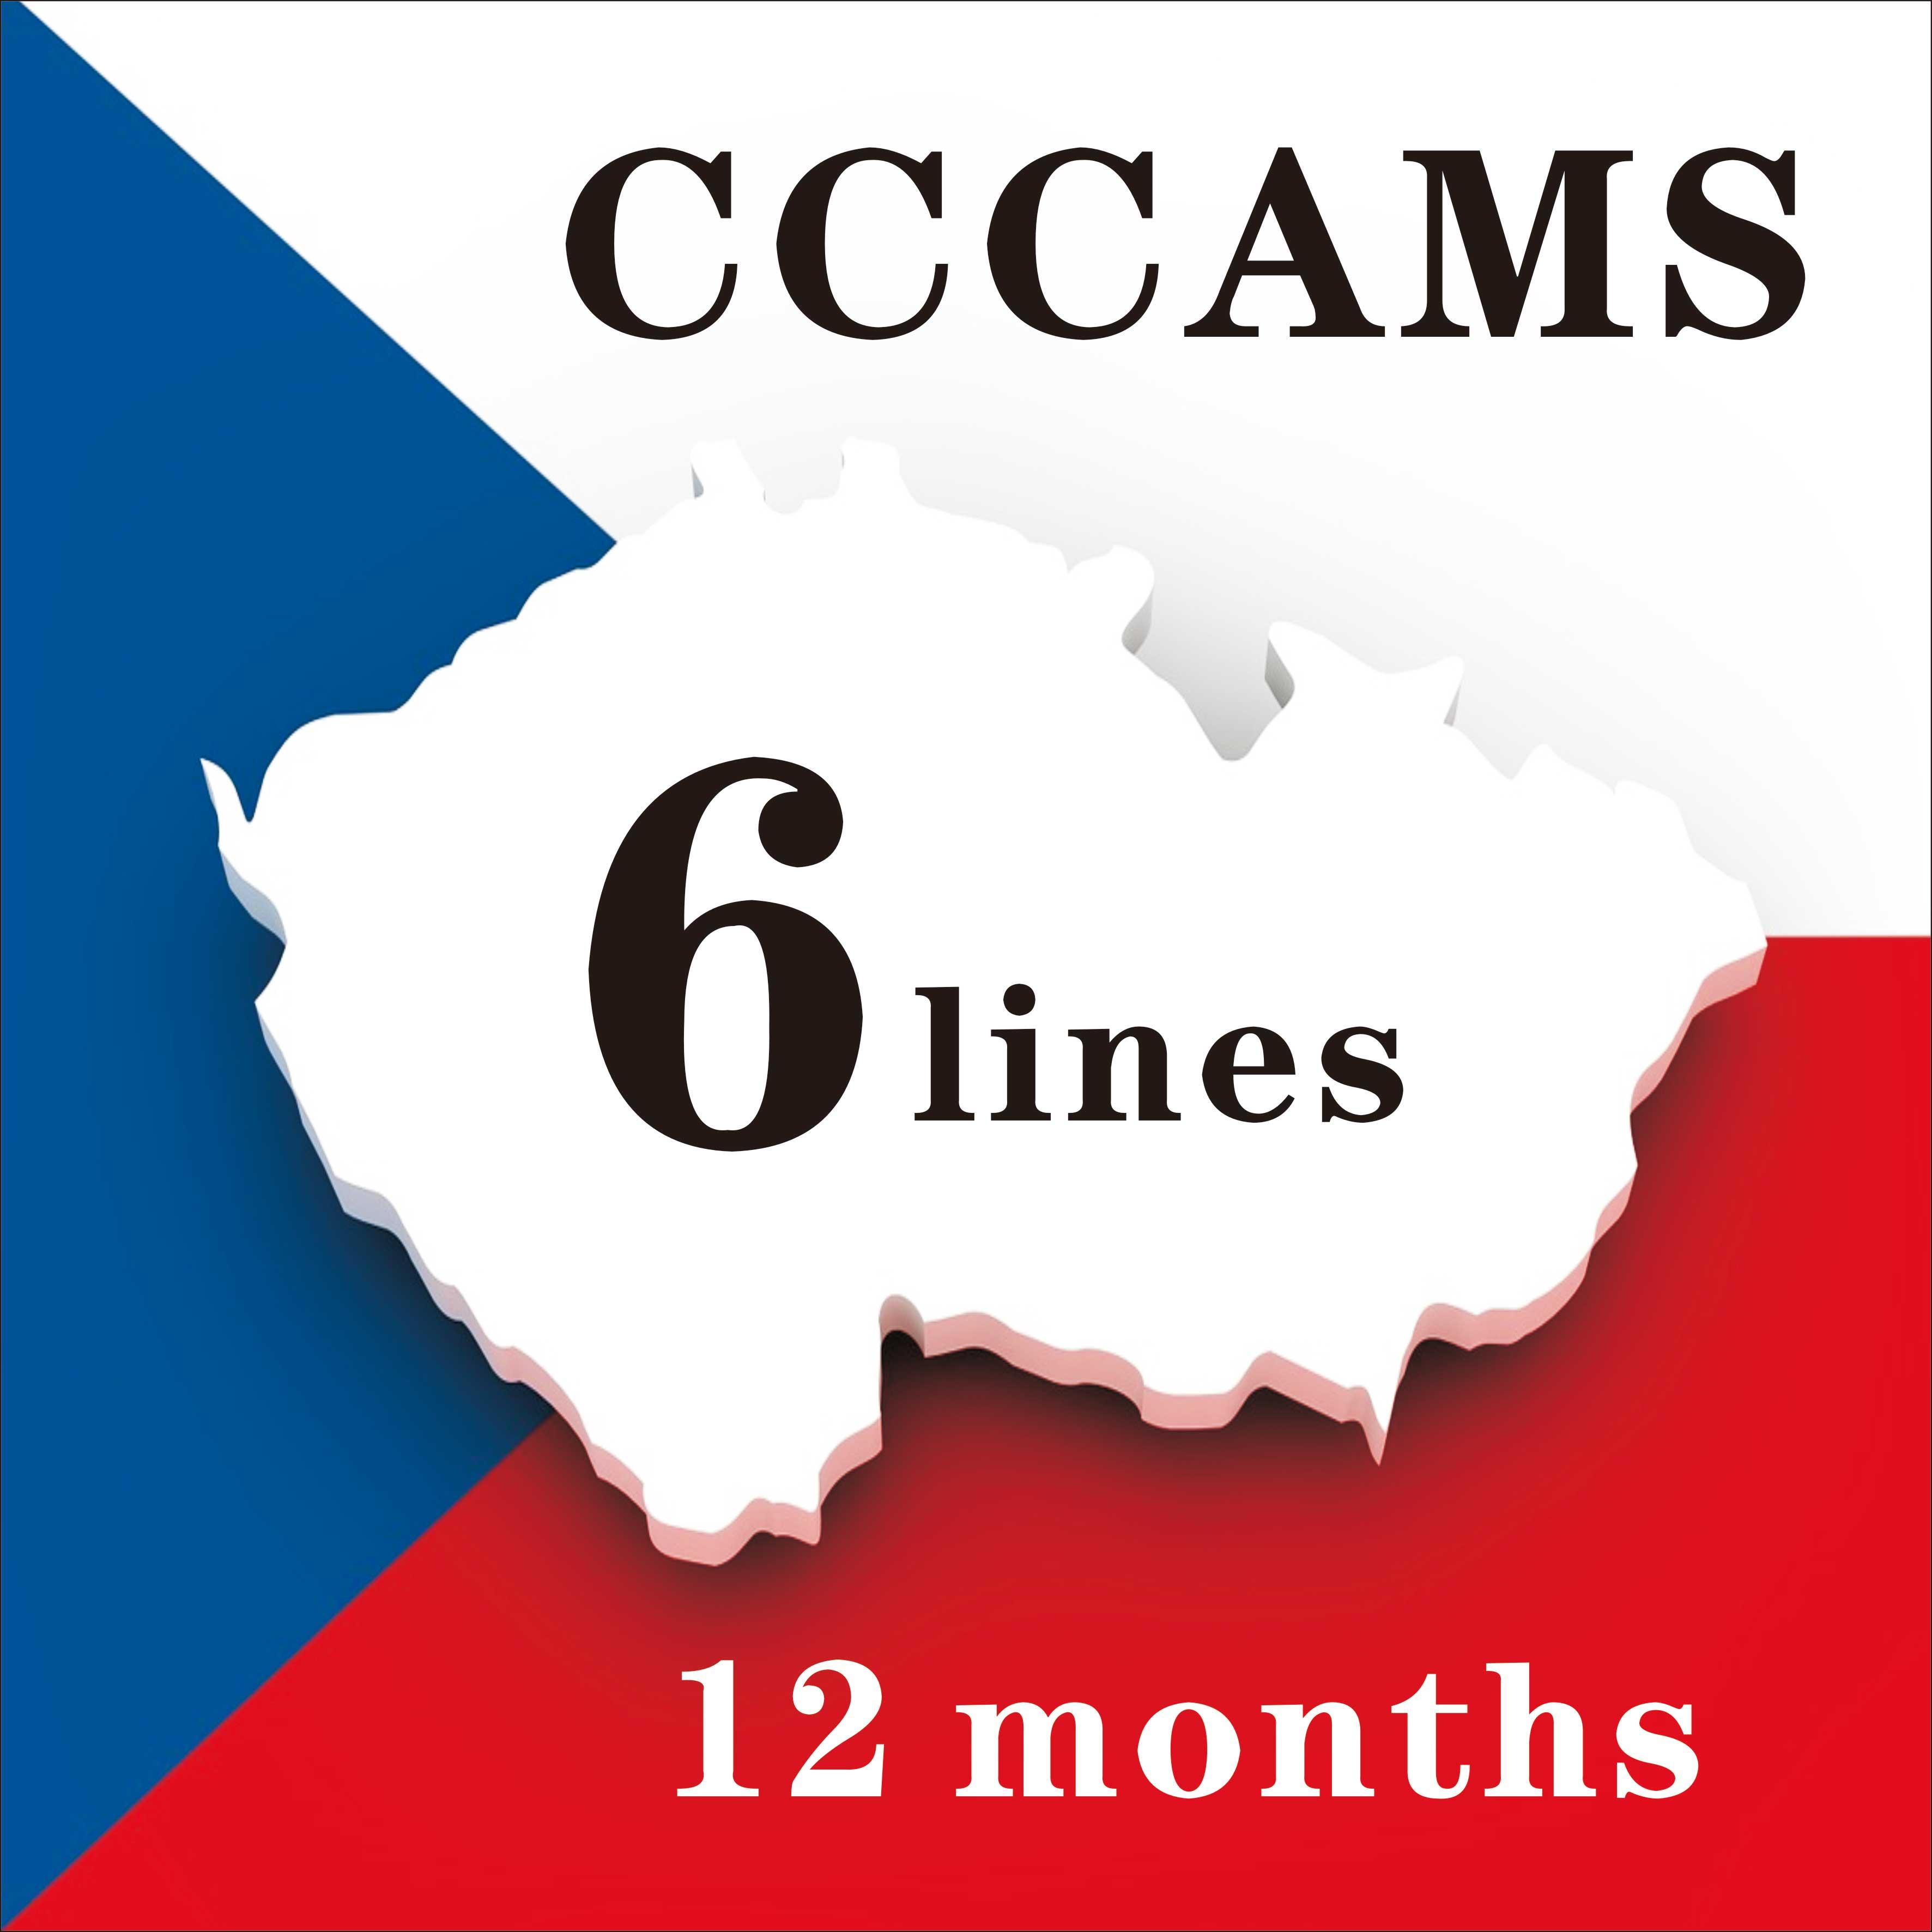 Especial para la República Checa Europa HD 1 año Cccam España Portugal Polonia receptor de televisión por satélite 6 líneas para DVB-S2 caja V8